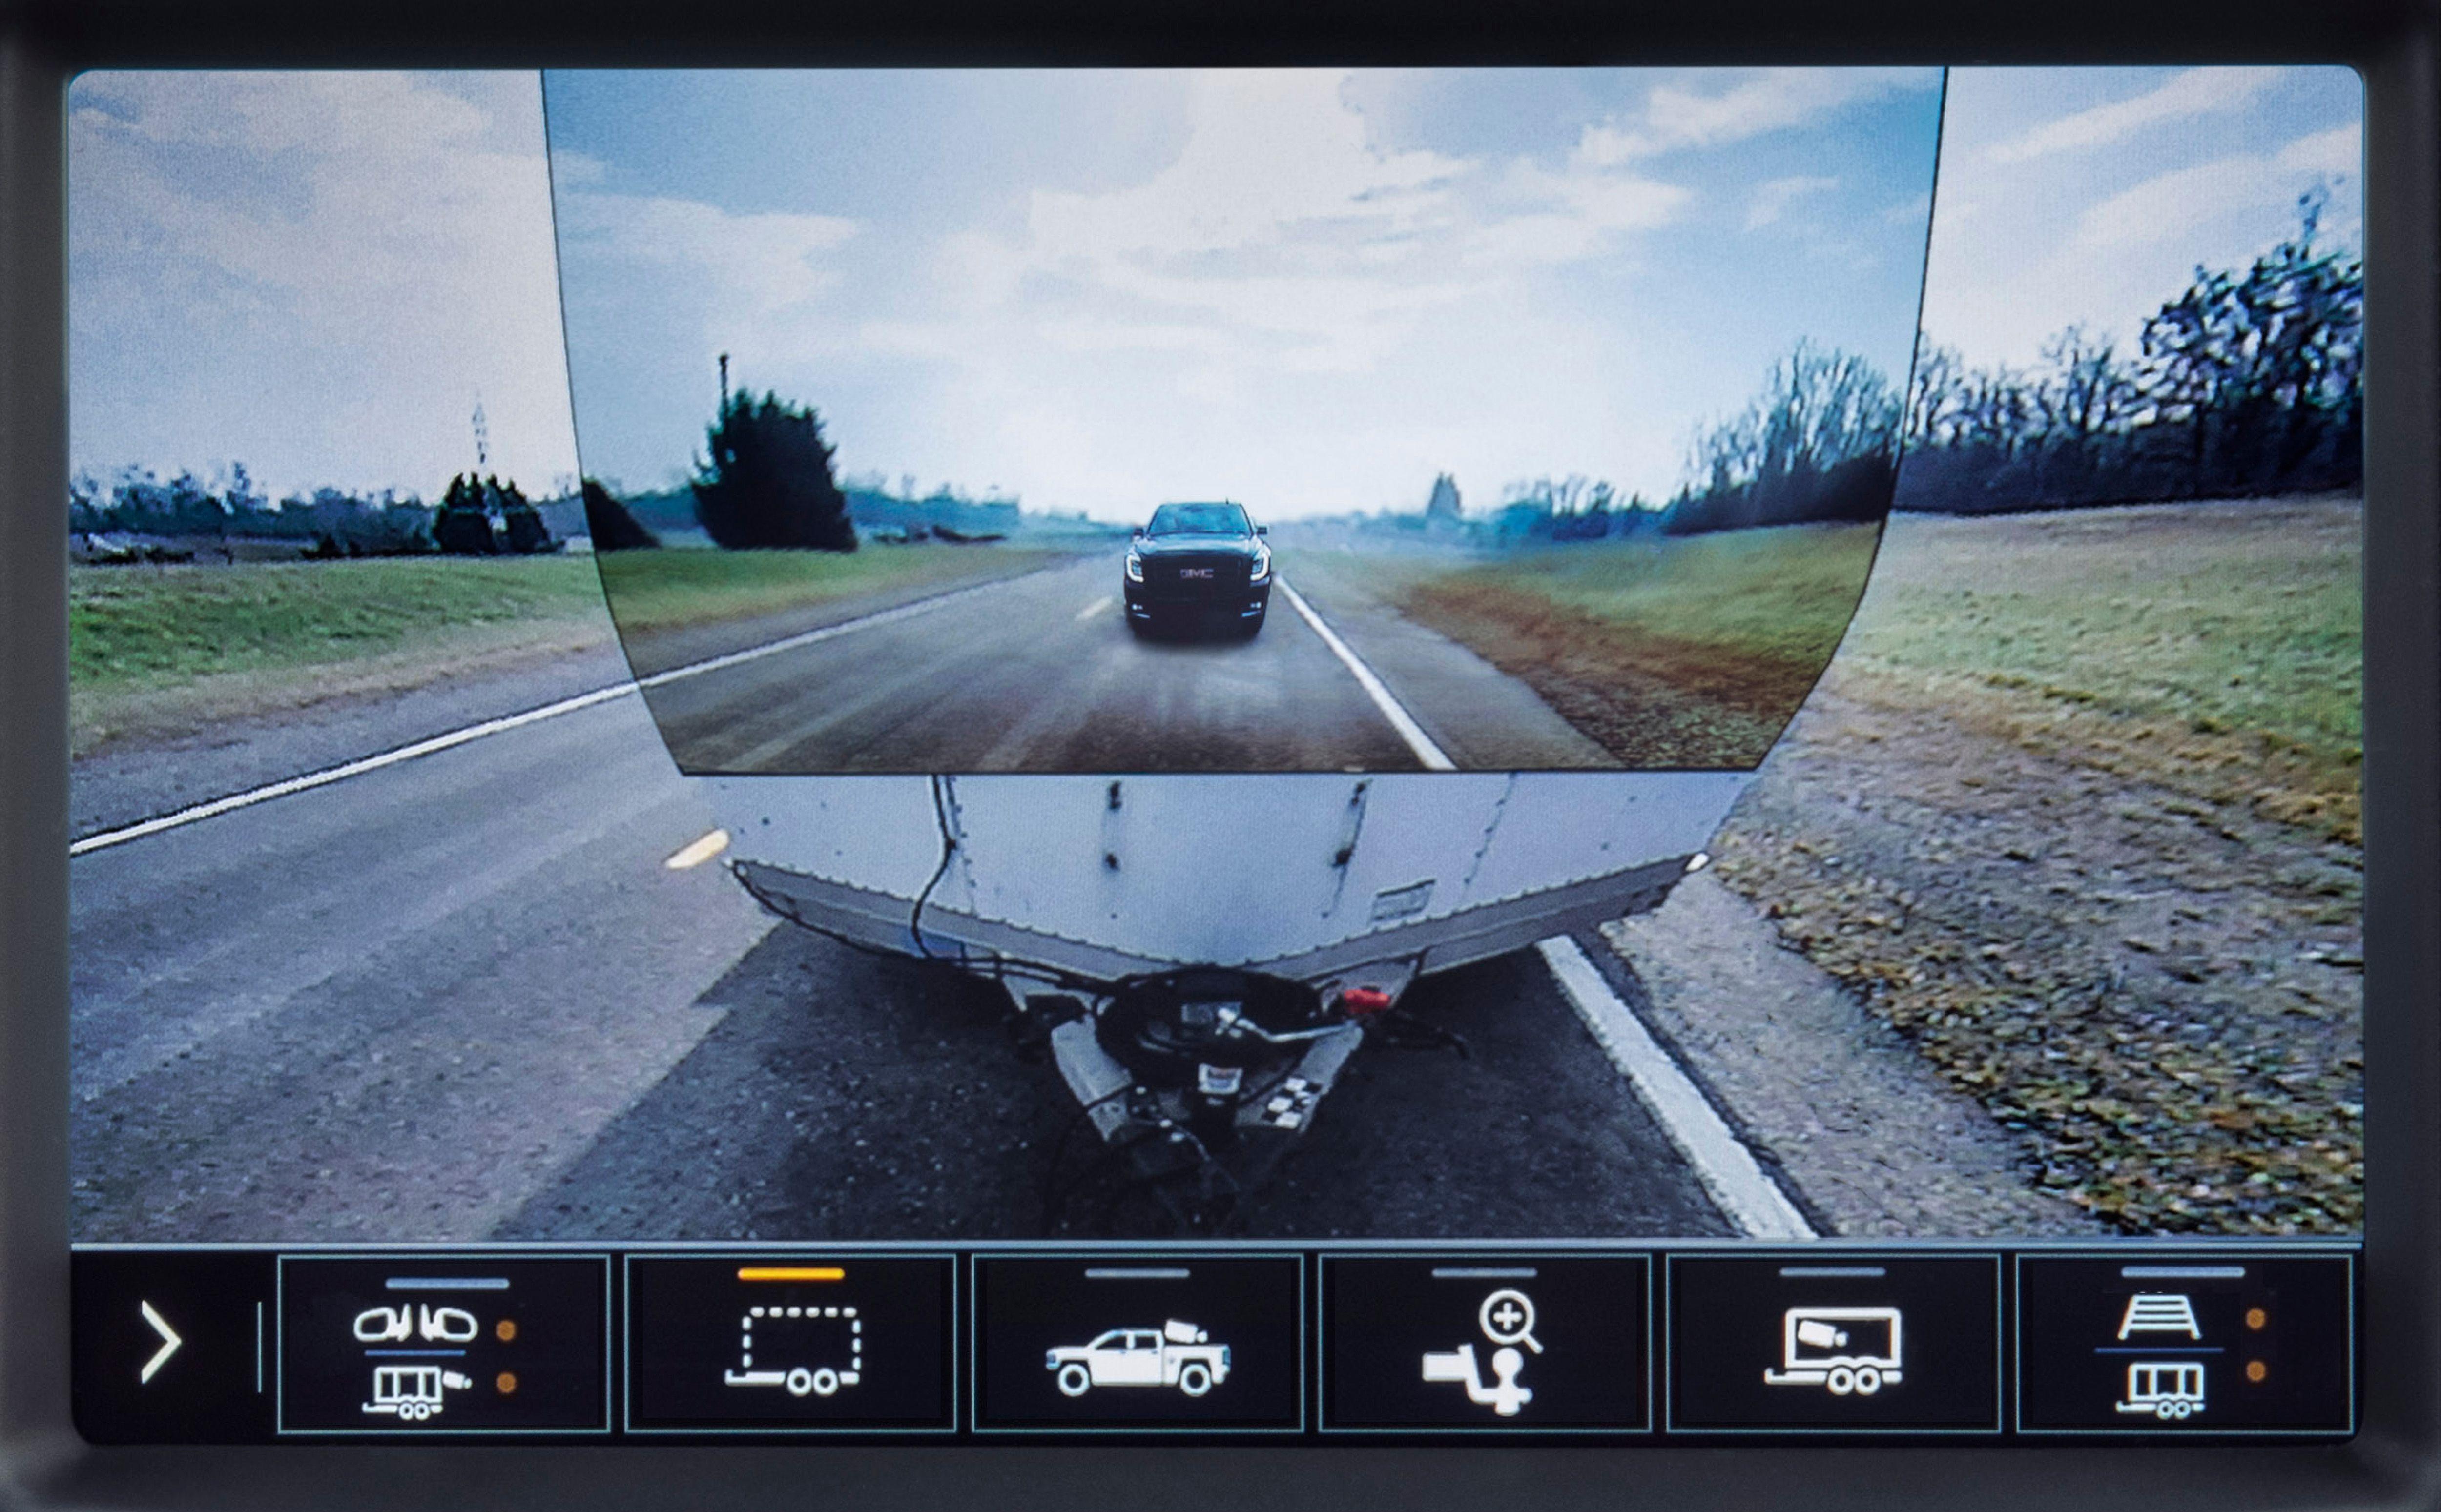 Best Backup Camera 2020 2020 GMC Sierra Heavy Duty Trailer Camera   New GMC 2500 and 3500